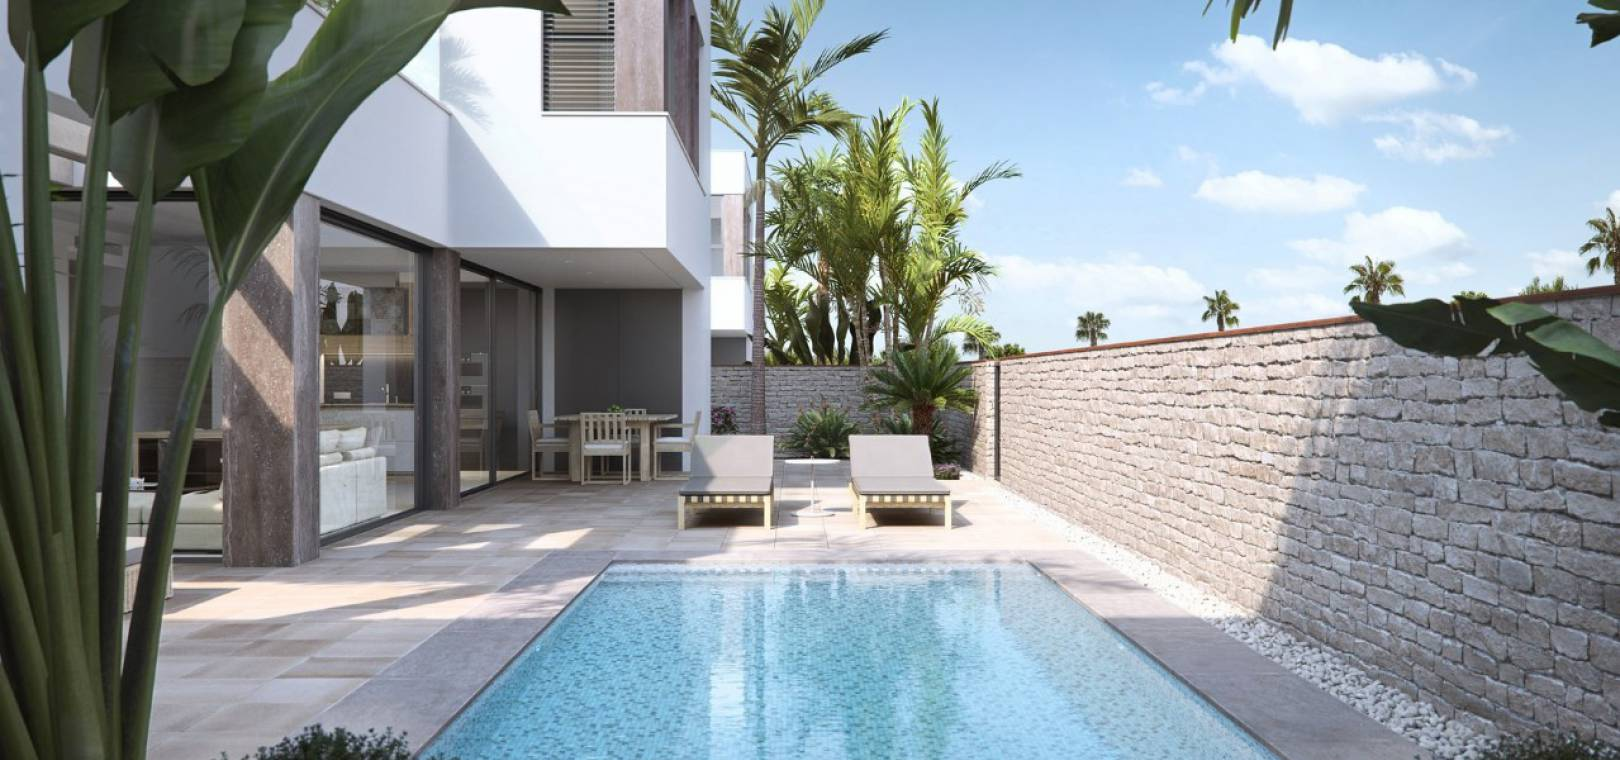 Torre_de_la_Horadada_New_Build_Luxury_Houses_For_Sale_nsp256_3